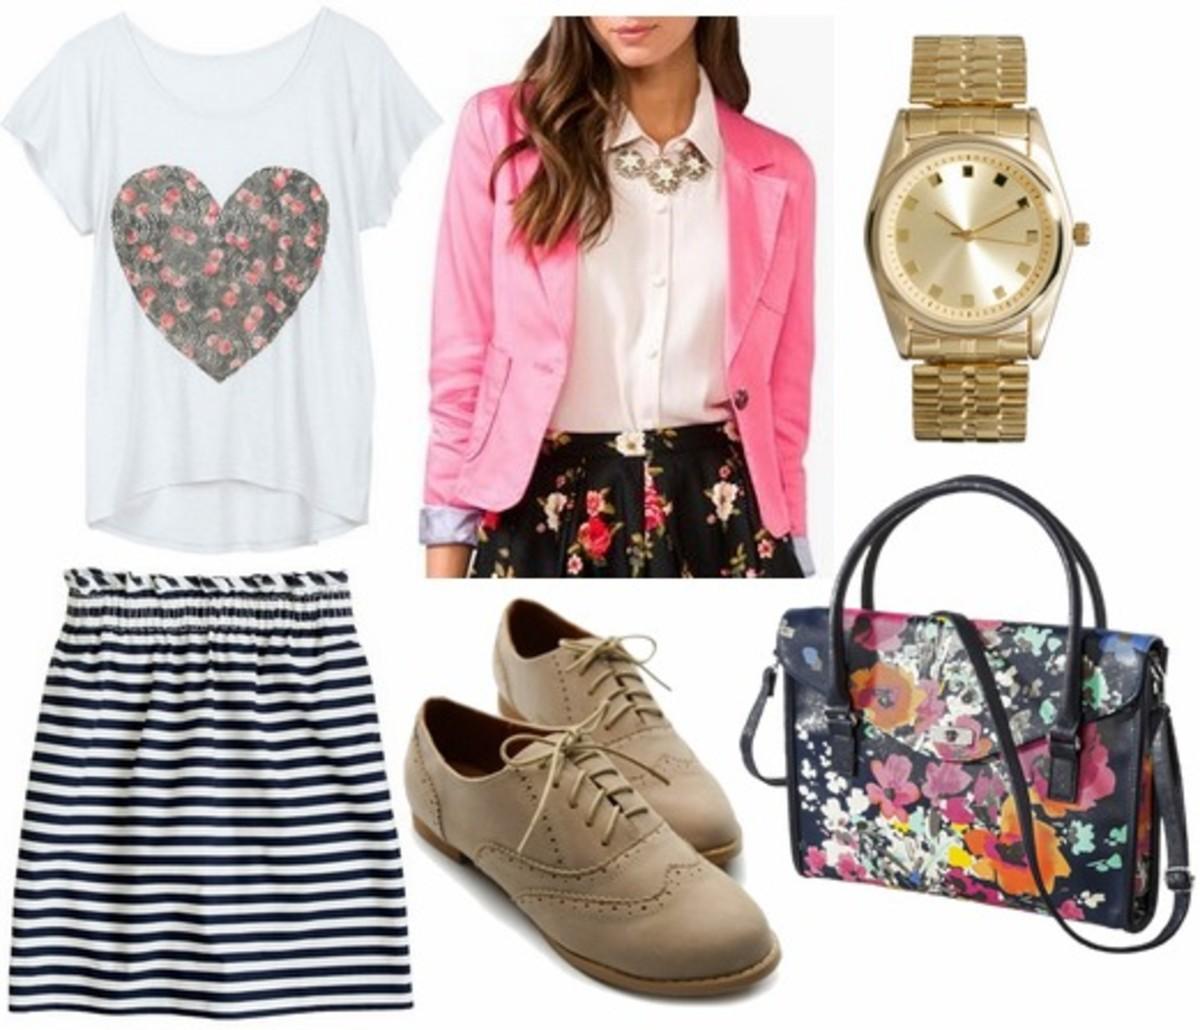 black-mini-skirt-stripe-white-graphic-tee-tan-shoe-brogues-floral-print-watch-pink-magenta-jacket-blazer-spring-summer-lunch.jpg